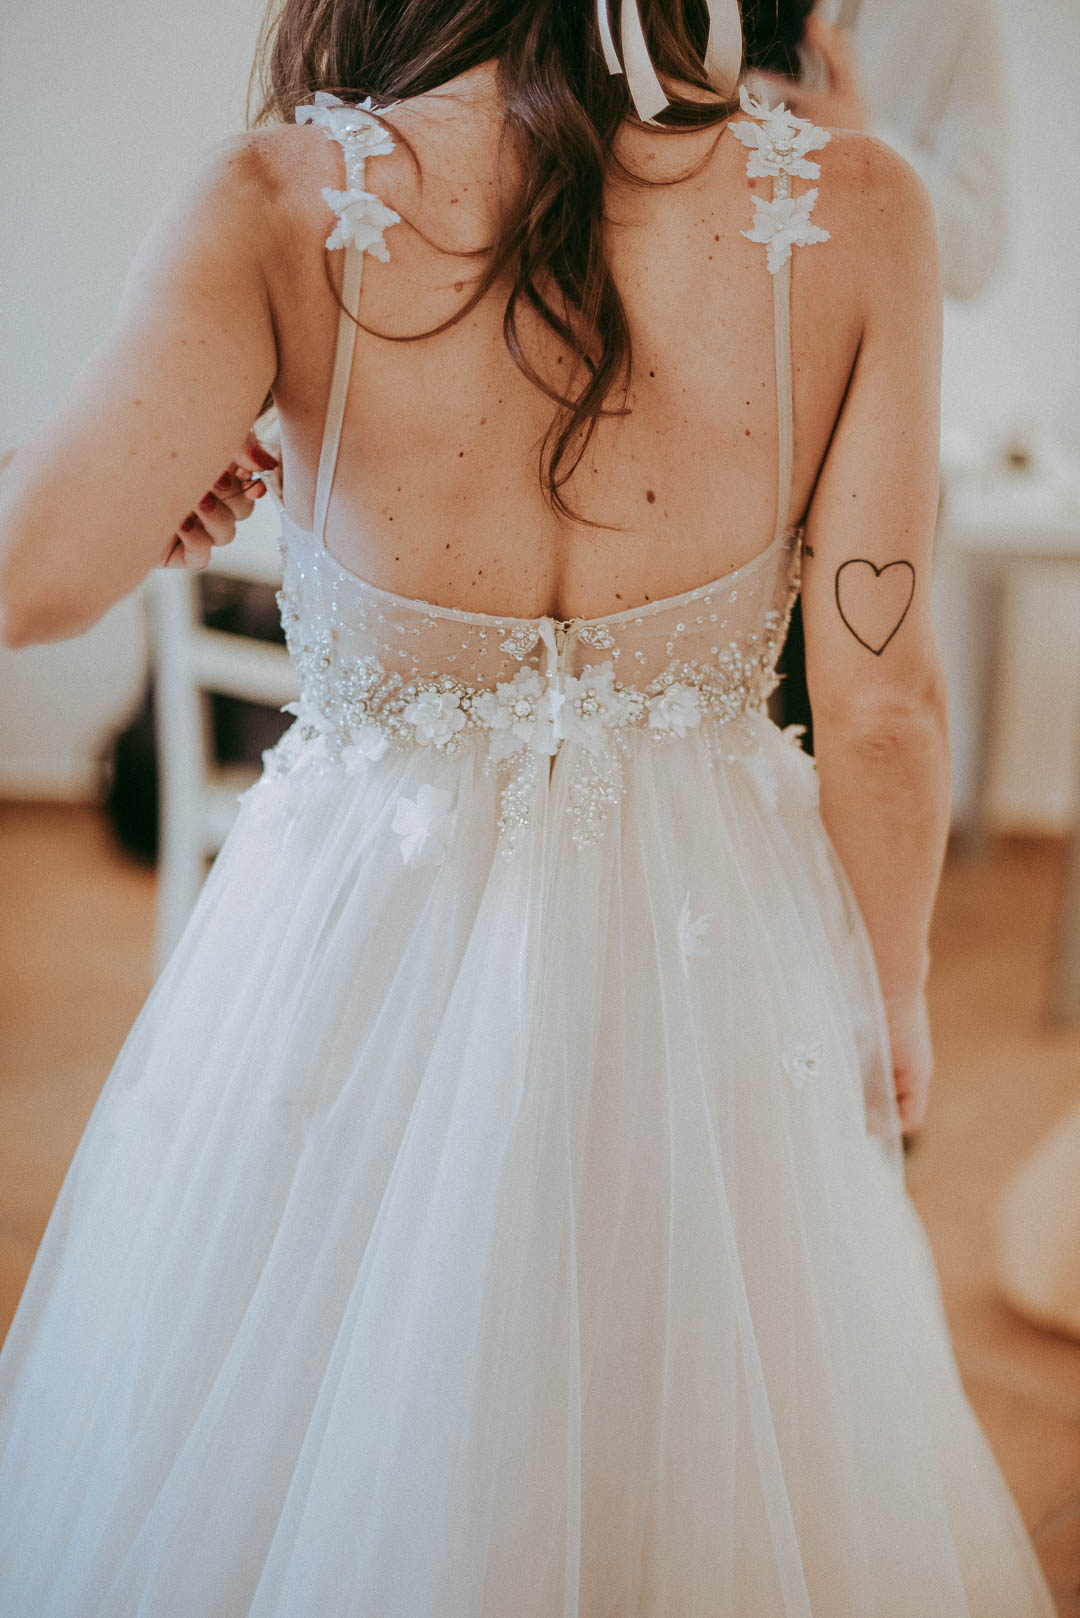 wedding-photographer-destination-fineart-bespoke-reportage-amalficoast-torrelacerniola-vivianeizzo-spazio46-41